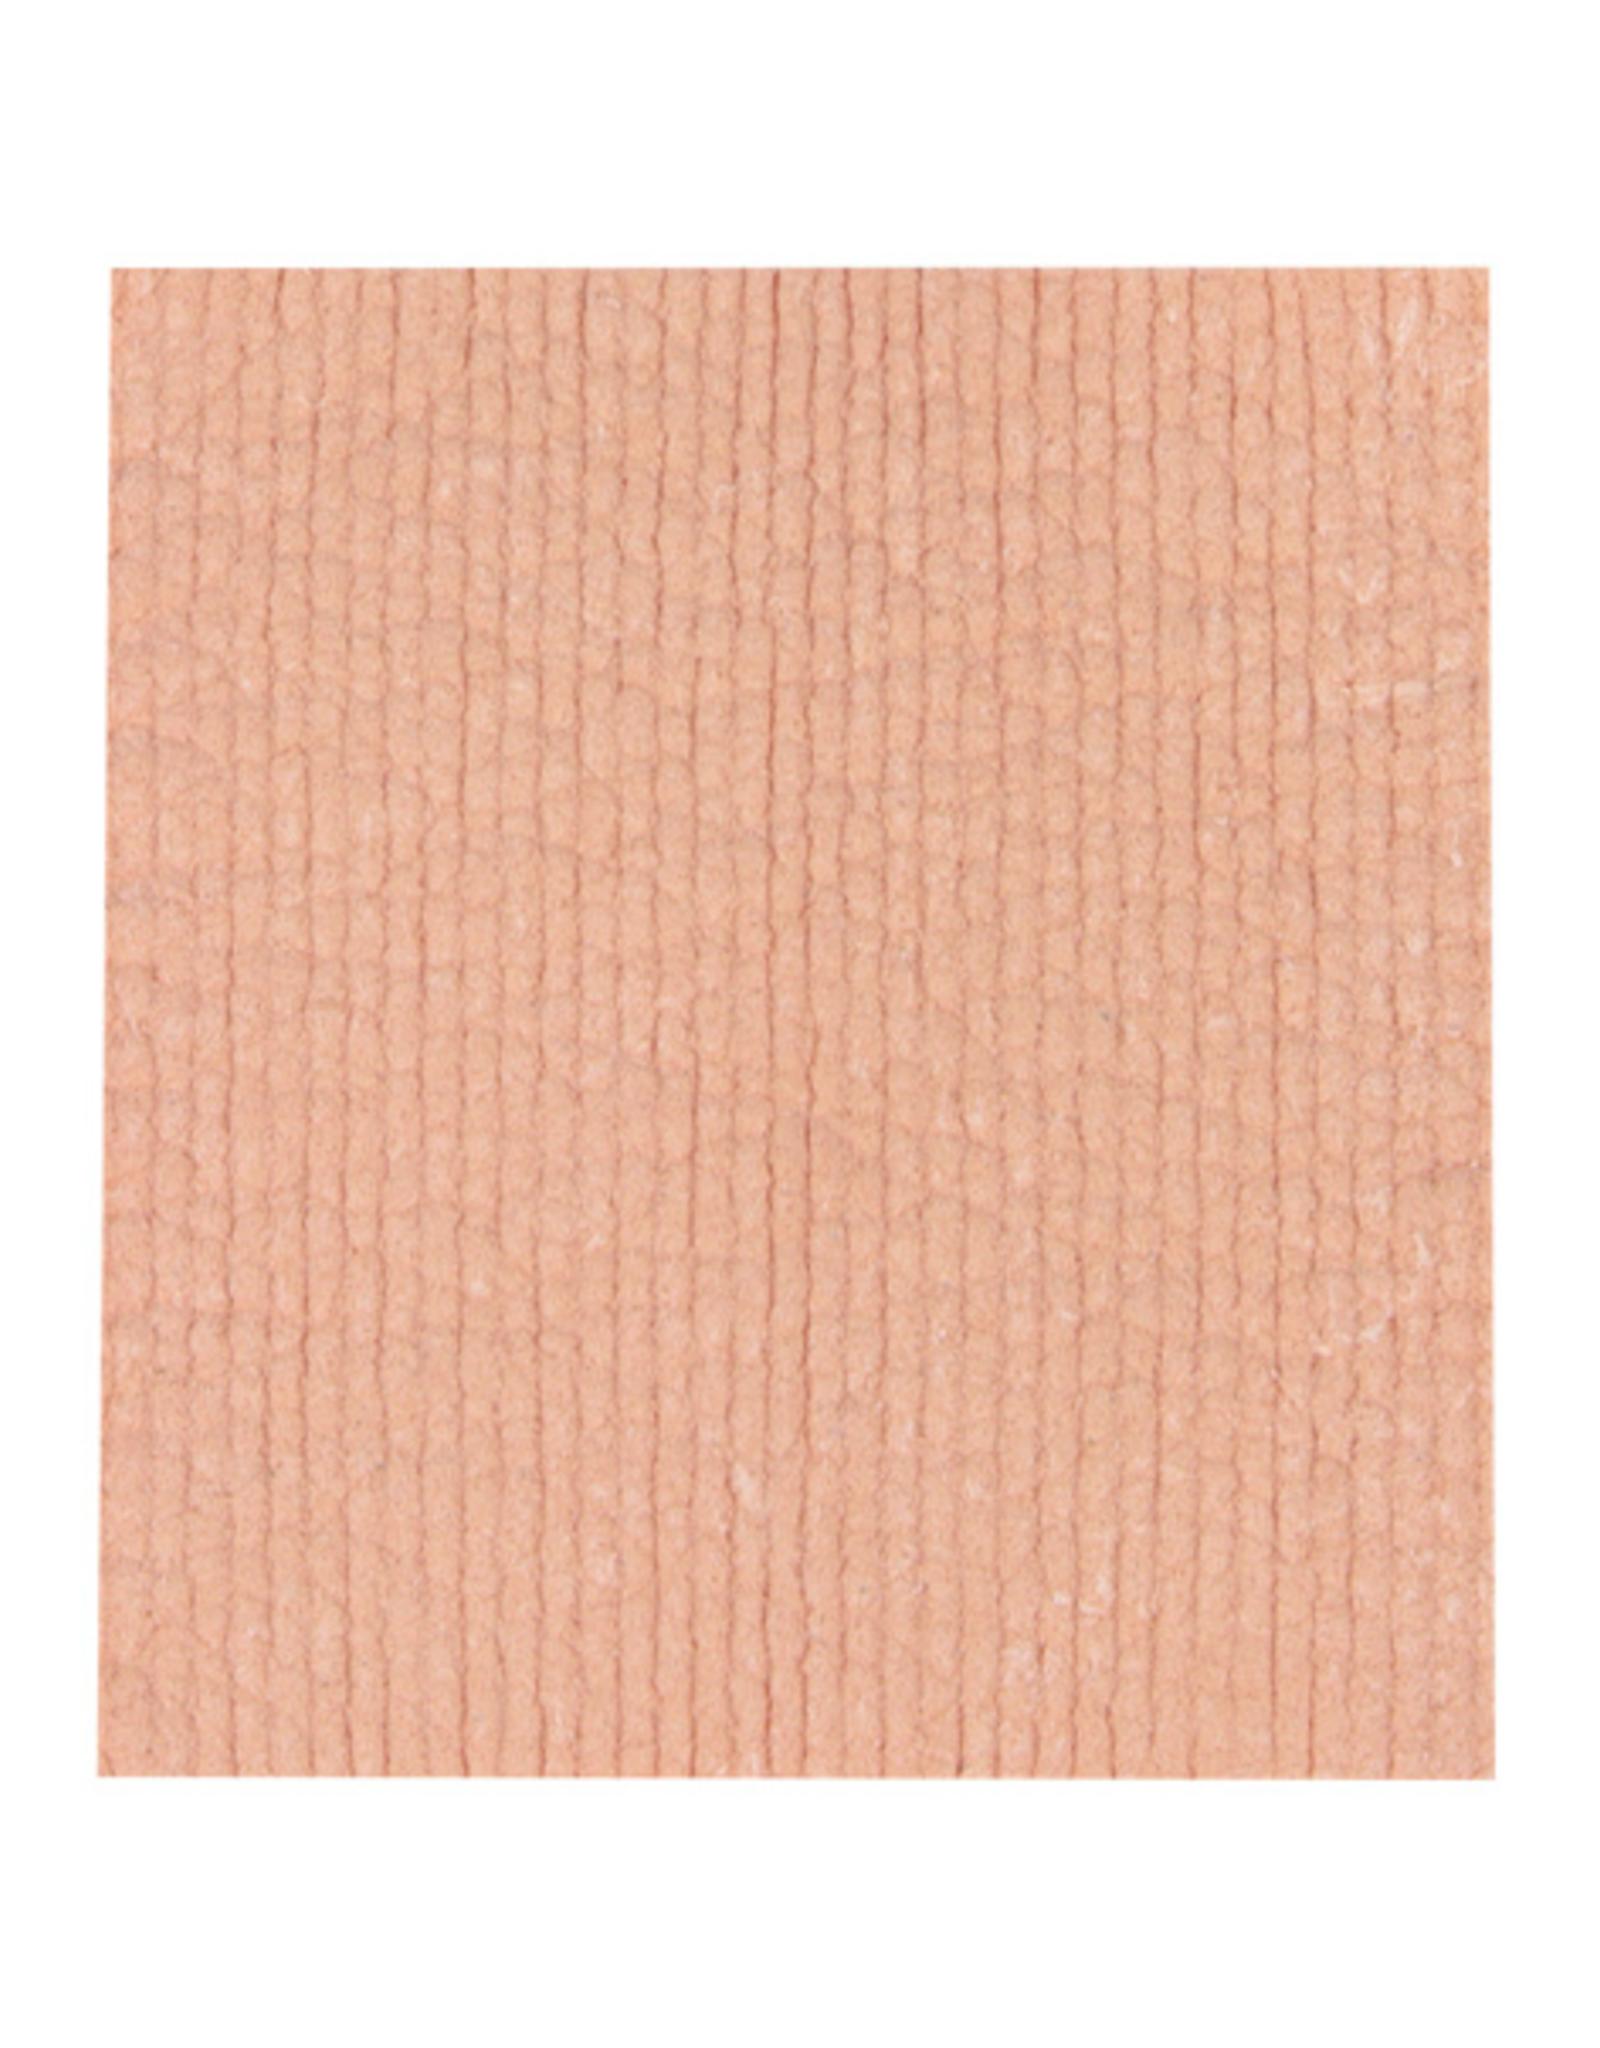 DCA - Swedish Sponge Cloth / Guava